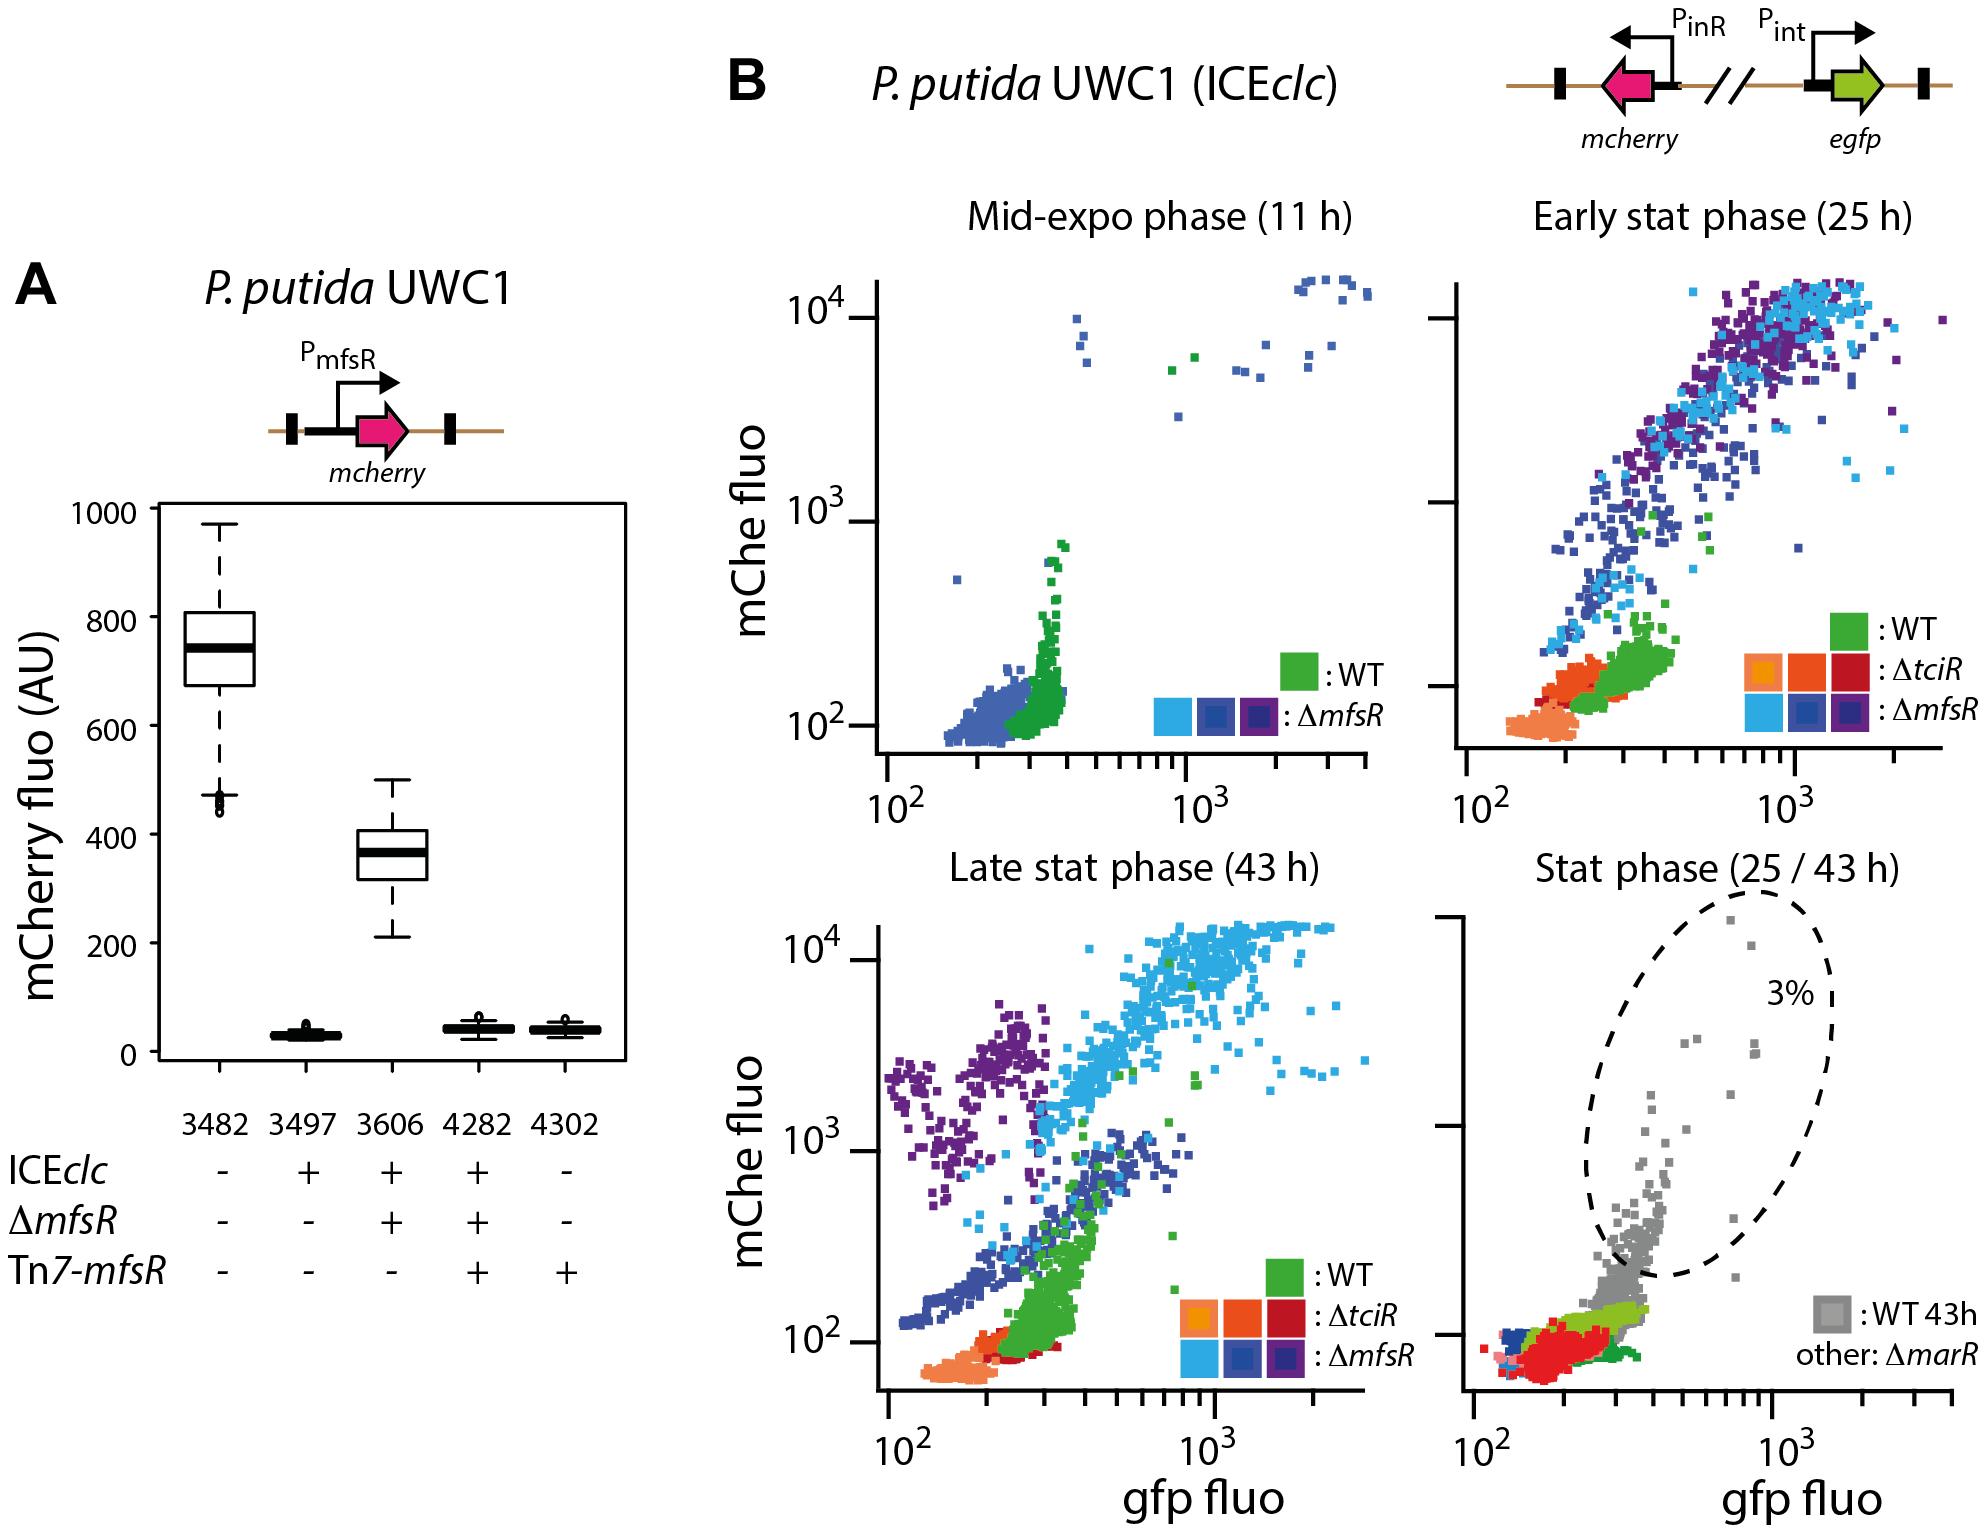 Effect of mutations in the <i>mfsR</i> region on the expression of the P<sub>mfsR</sub>-, P<sub>int</sub>- and P<sub>inR</sub>-promoters of ICE<i>clc</i> in <i>P. putida</i> UWC1.